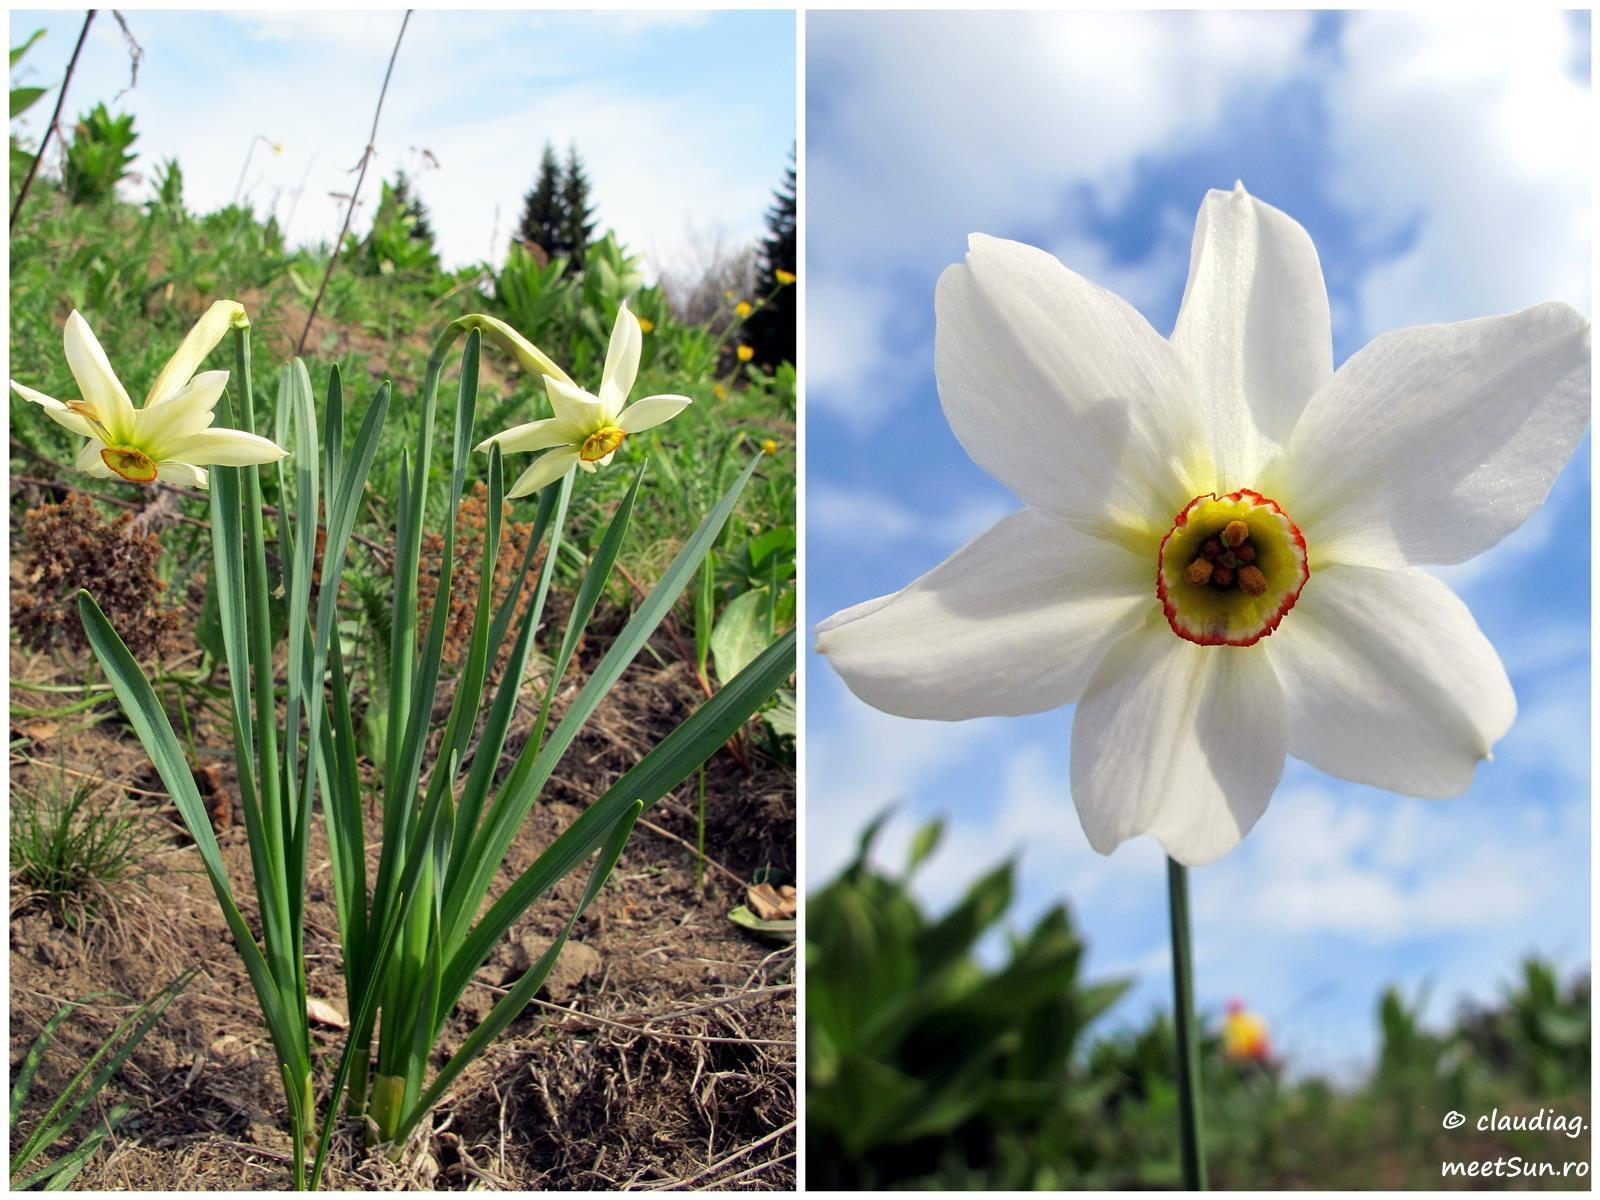 Narcissus radiiflorus